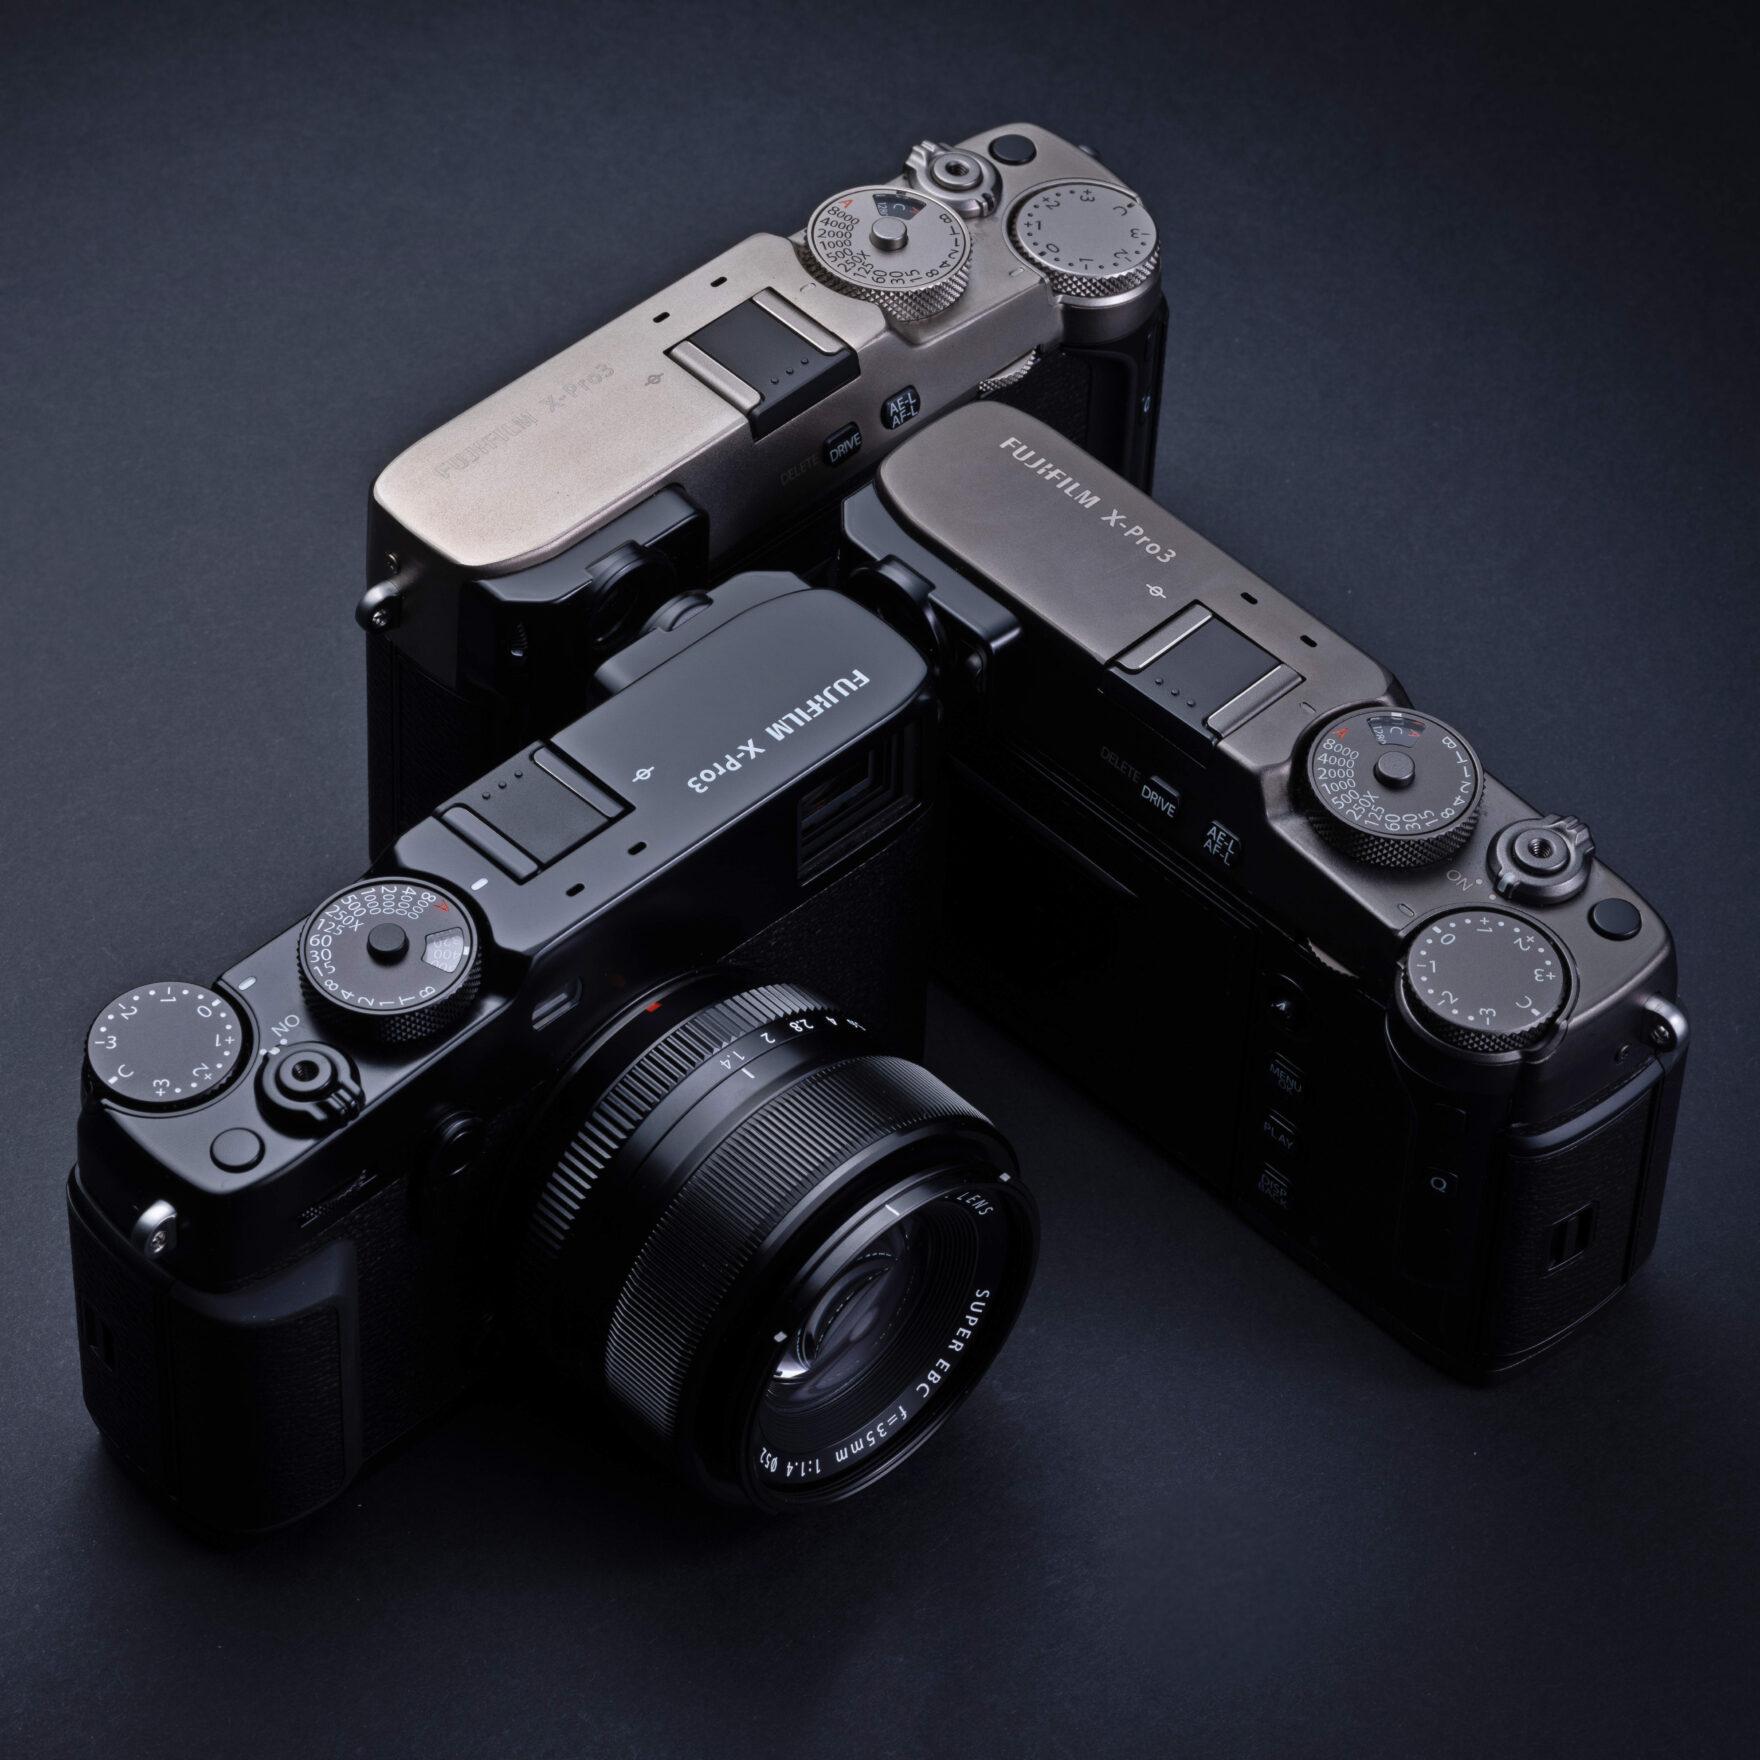 Systemkamera Fujifilm X-Pro3 mit robustem Titangehäuse